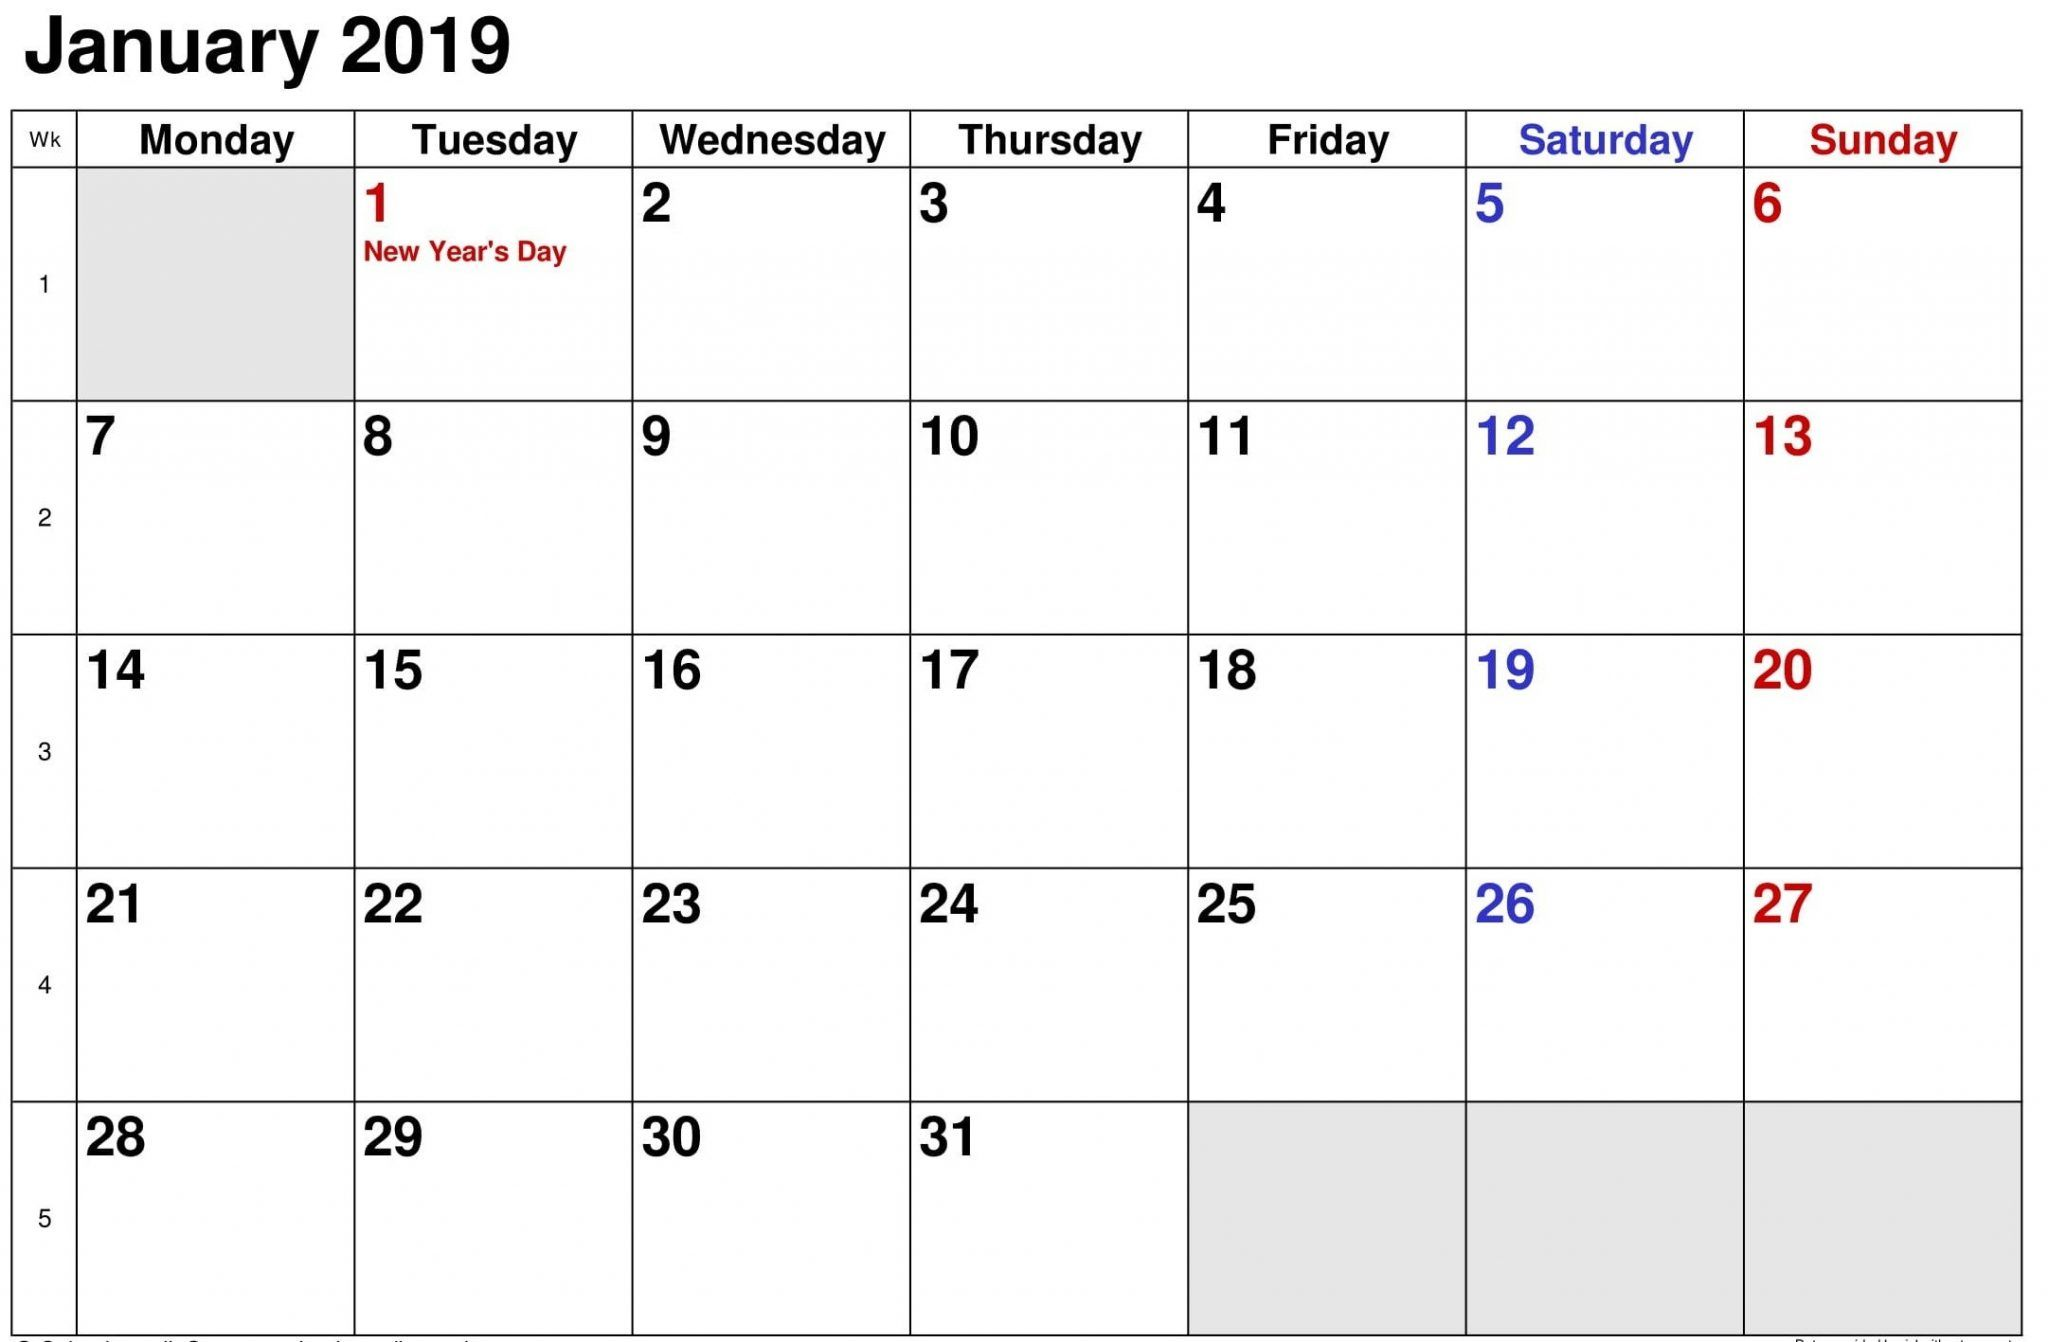 January Calendar With Holidays Printable